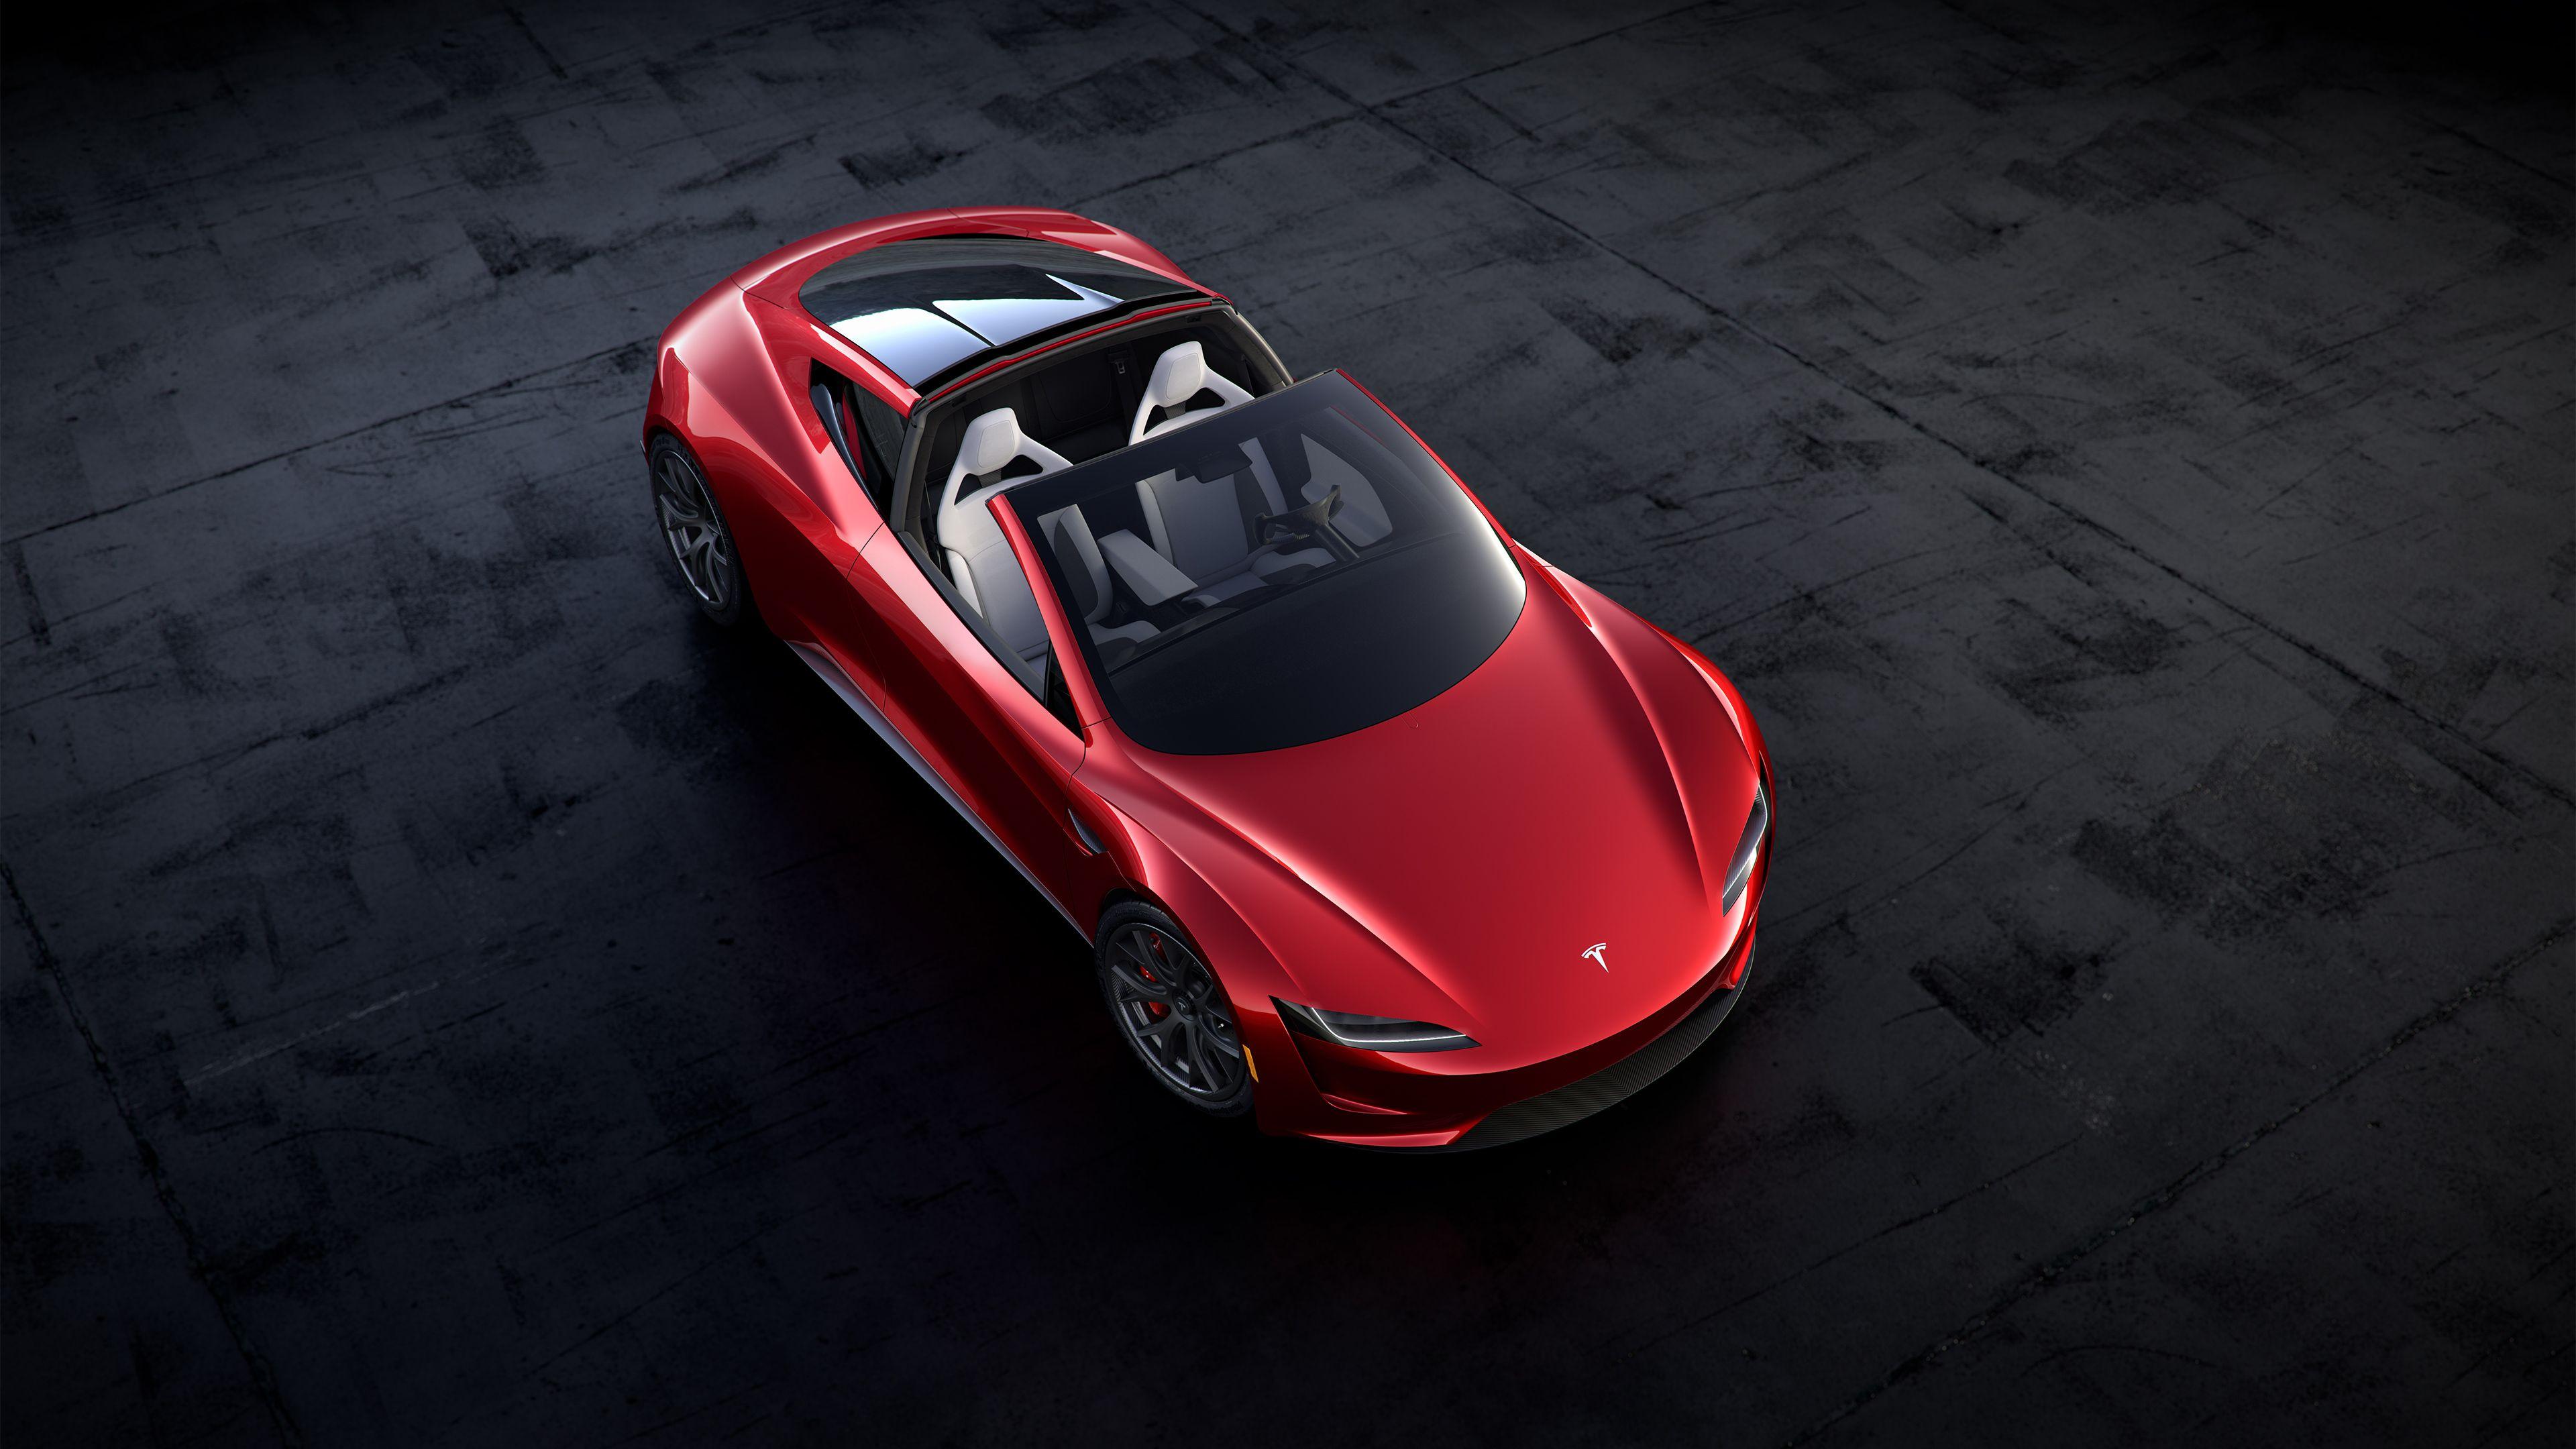 Best Desktop 2020 2020 Tesla Roadster Desktop Backgrounds | Wallpaper | New tesla